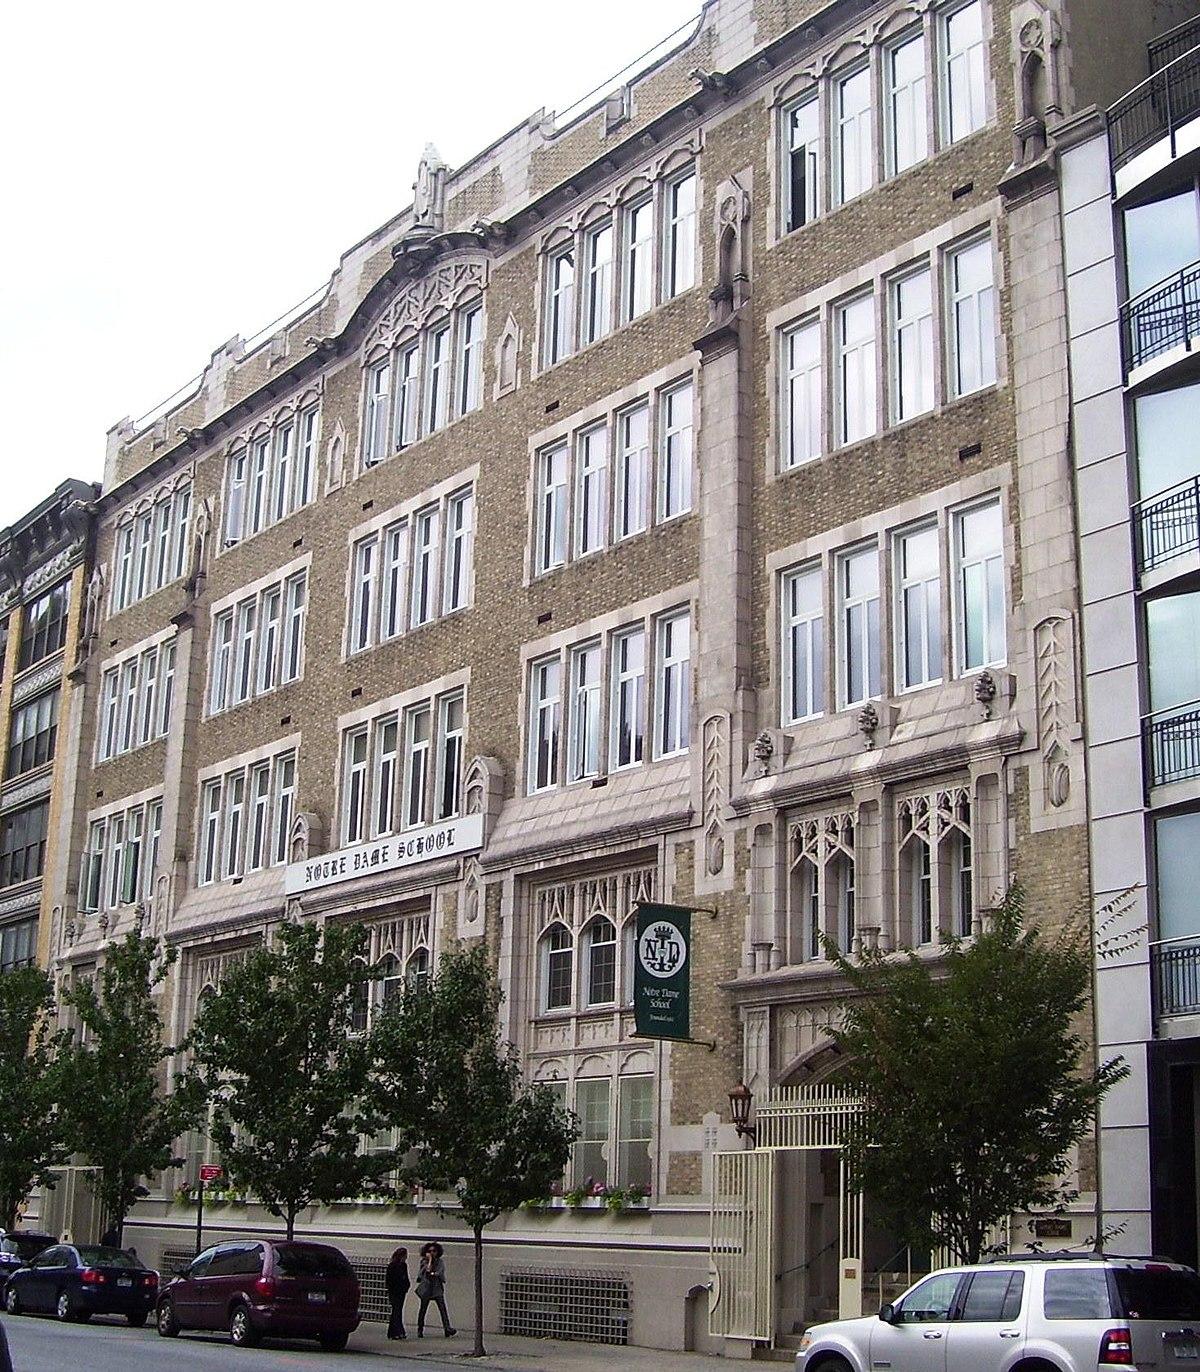 Notre dame school manhattan wikipedia for Design schools nyc